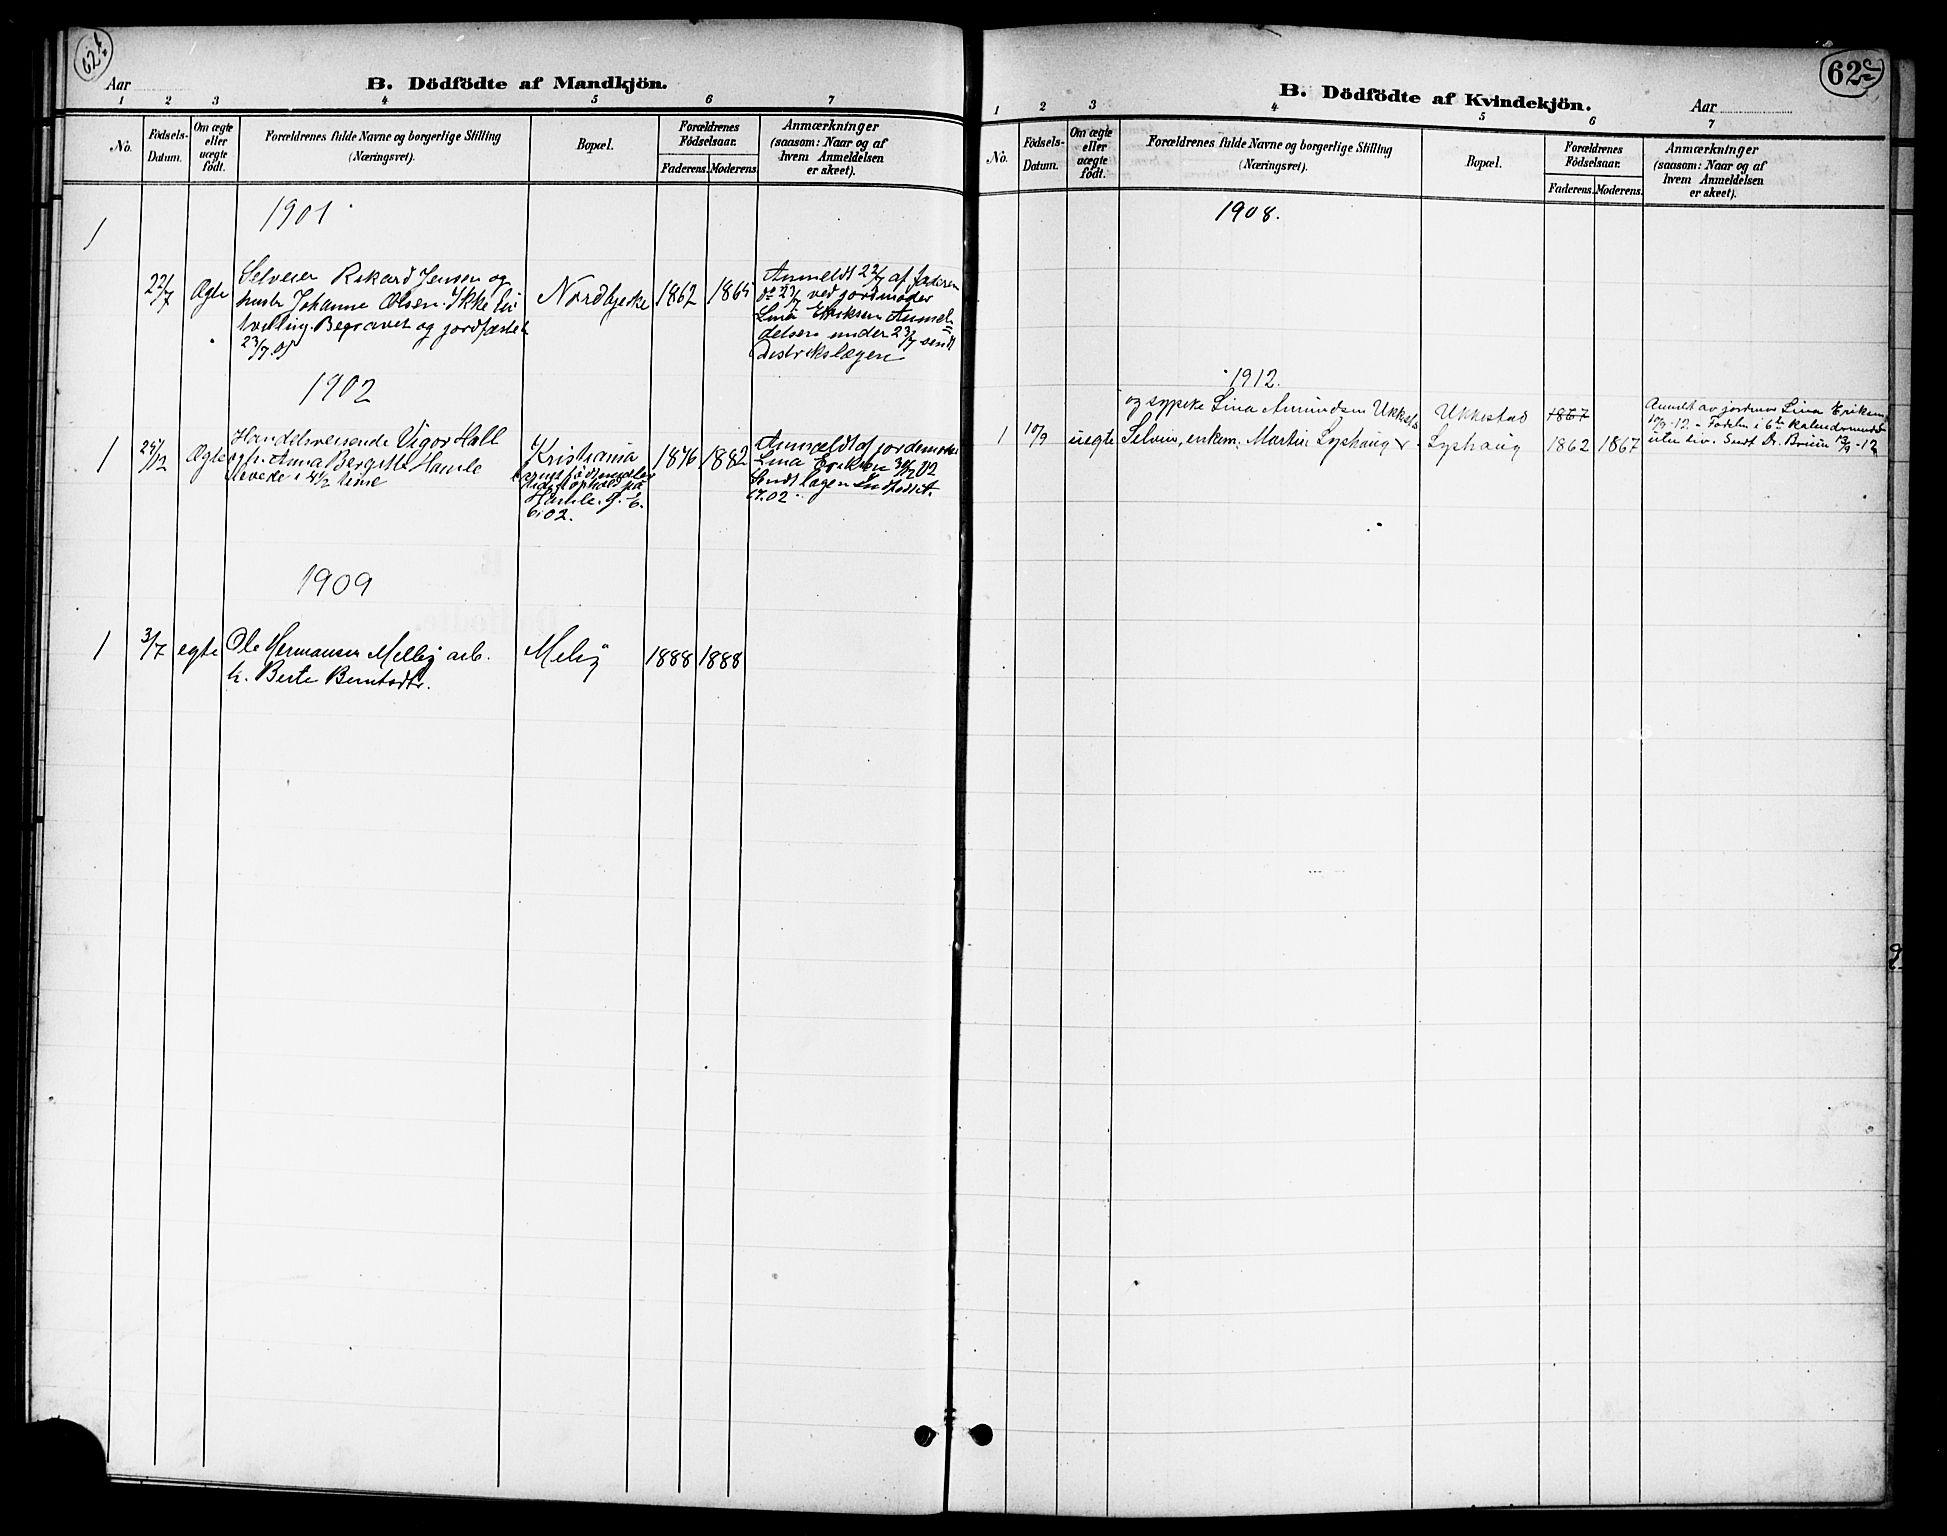 SAO, Nannestad prestekontor Kirkebøker, G/Ga/L0002: Klokkerbok nr. I 2, 1901-1913, s. 62b-62c